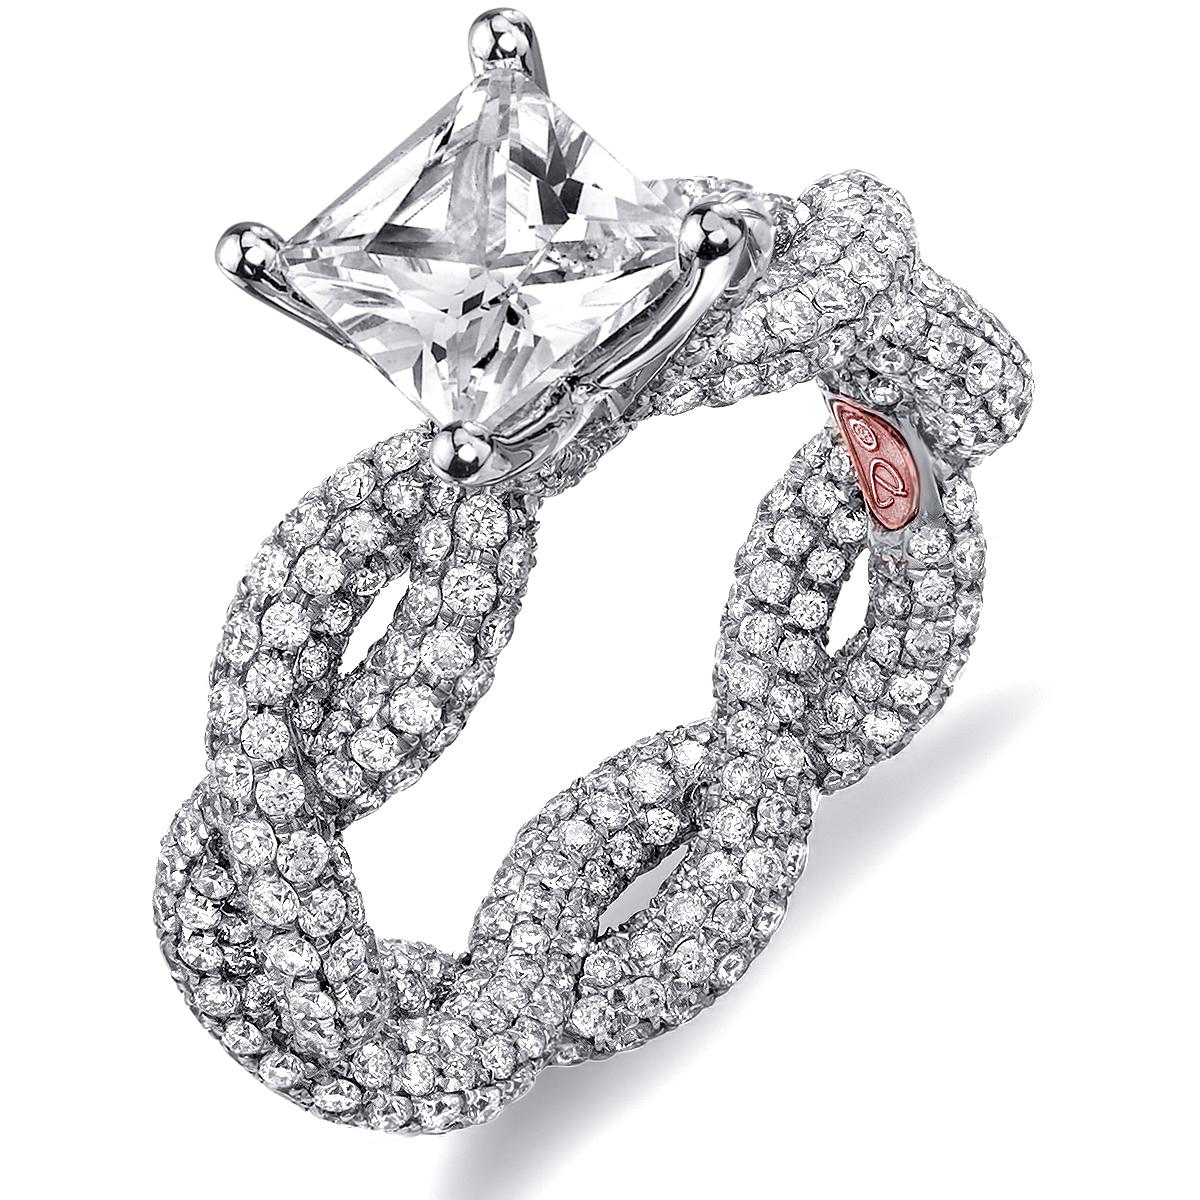 twisted princess cut engagement rings princess cut wedding rings Twisted Princess Cut Engagement Rings